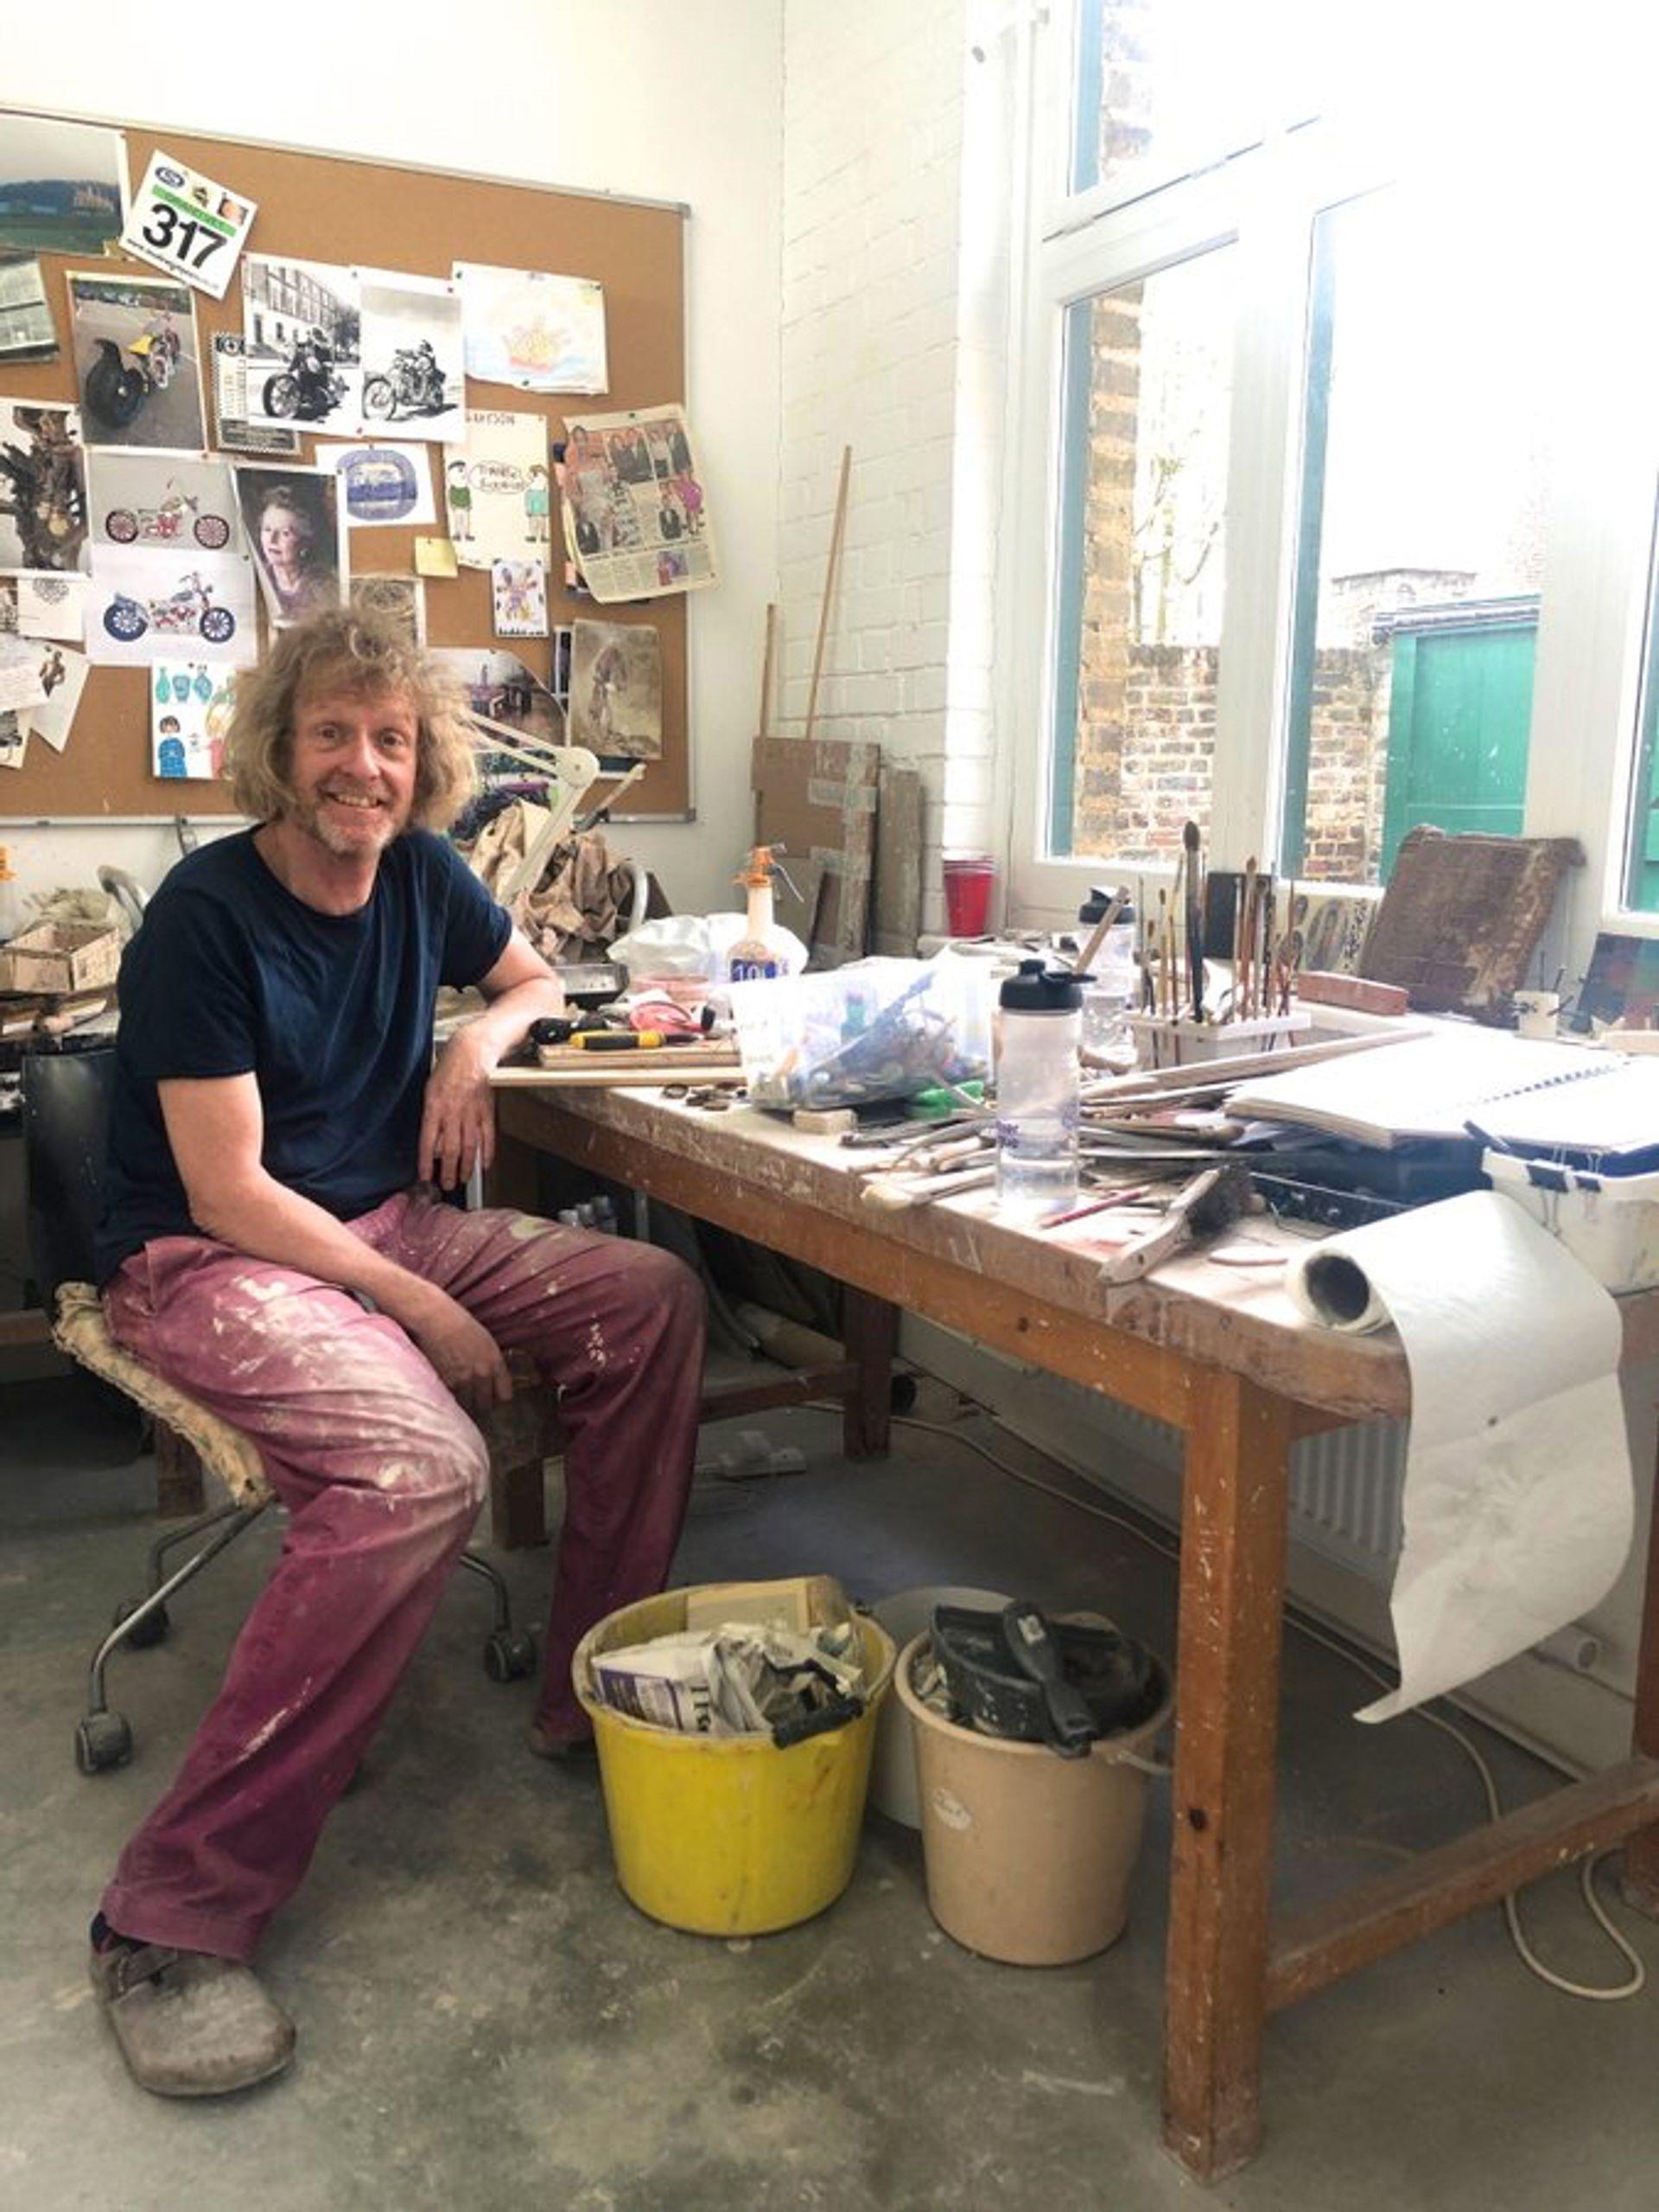 Grayson Perry in his studio courtesy of artist